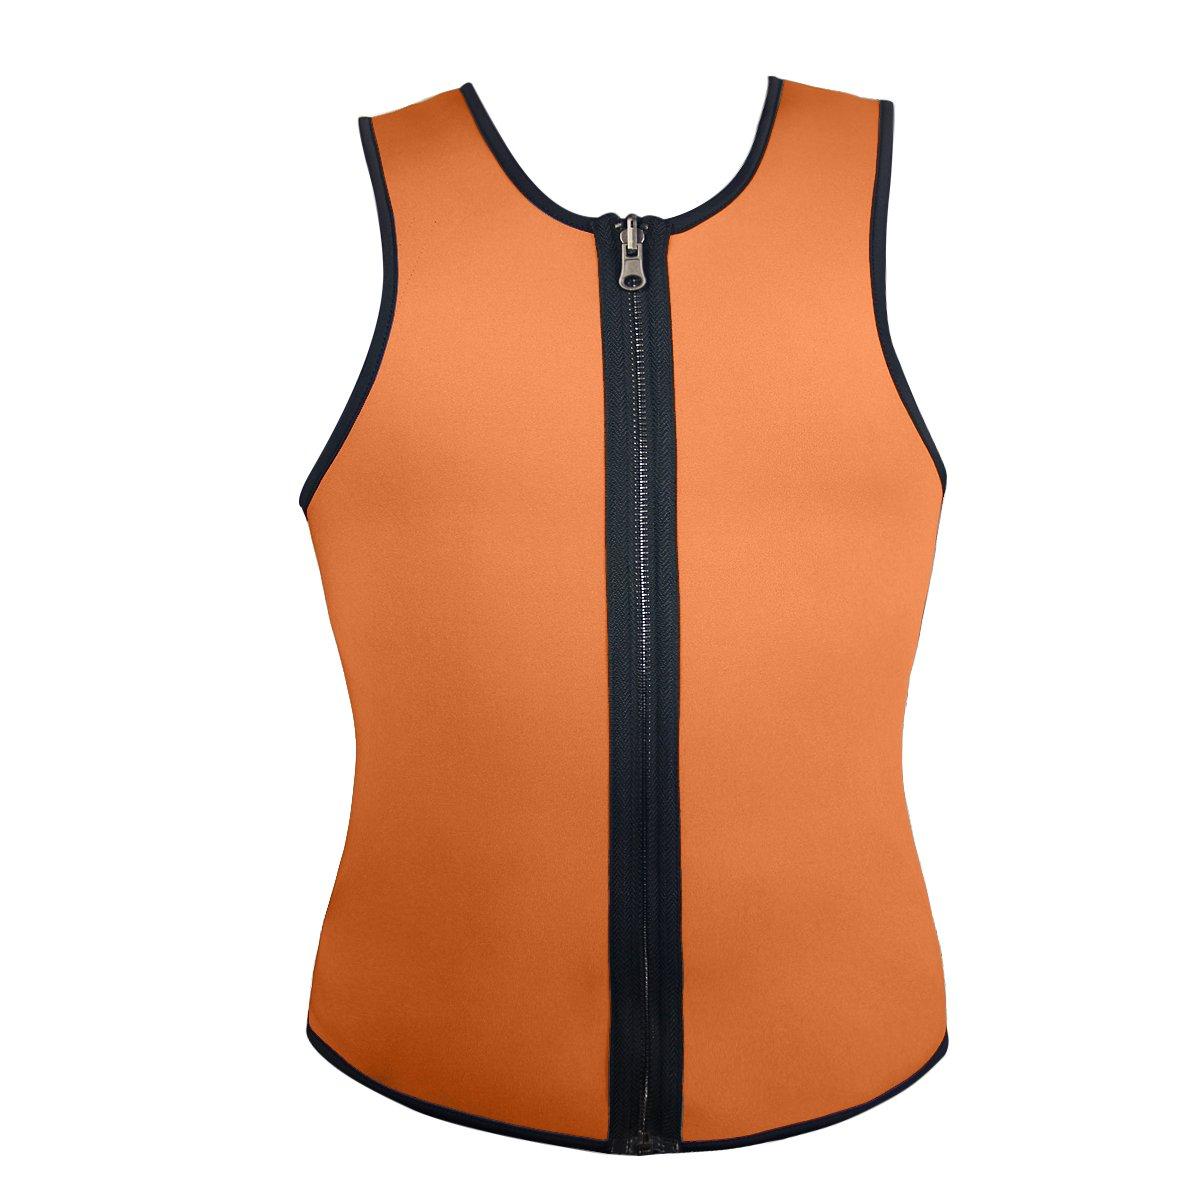 Men's Latex Workout Weight Loss Corset Reversible Training Zipper Vest yezhiyong-shop